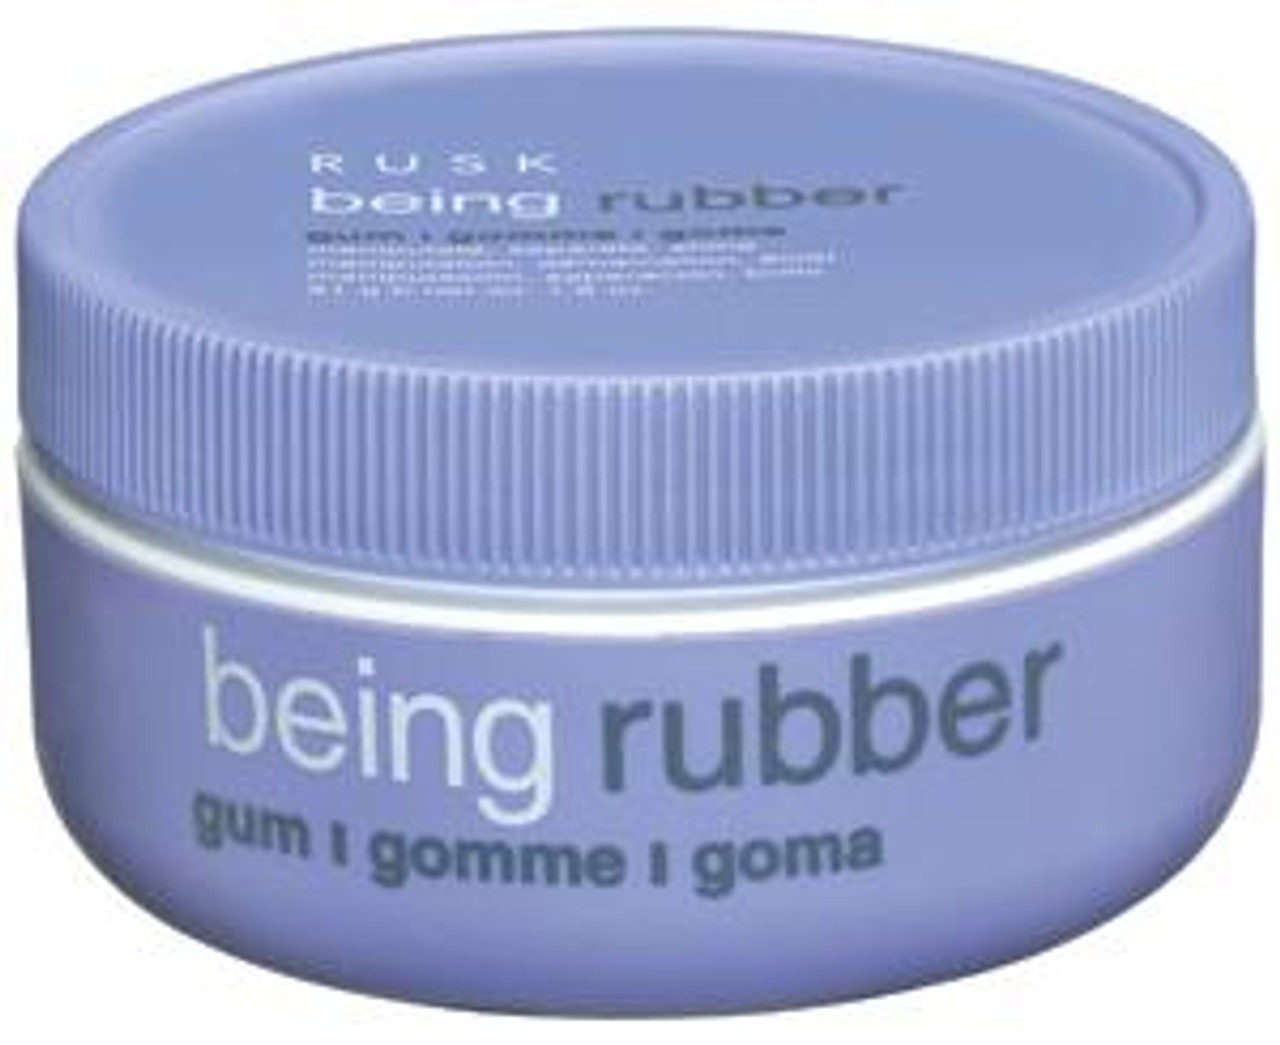 Rusk Being Rubber Gum Sleekshop Com Formerly Sleekhair